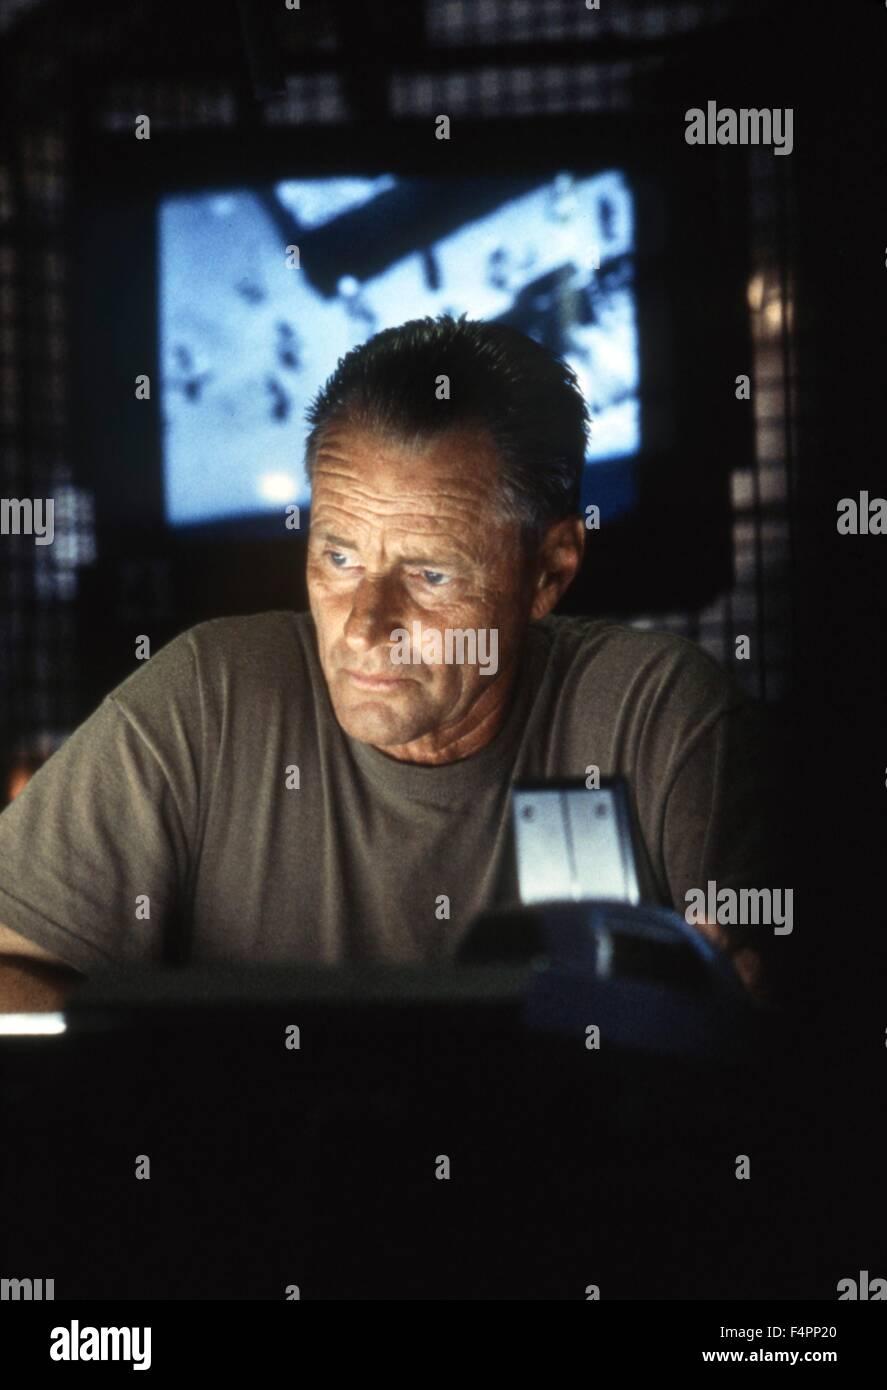 Sam Shepard / Black Hawk Down / 2001 directed by Ridley Scott  [Revolution studios / Sony Pictur] - Stock Image